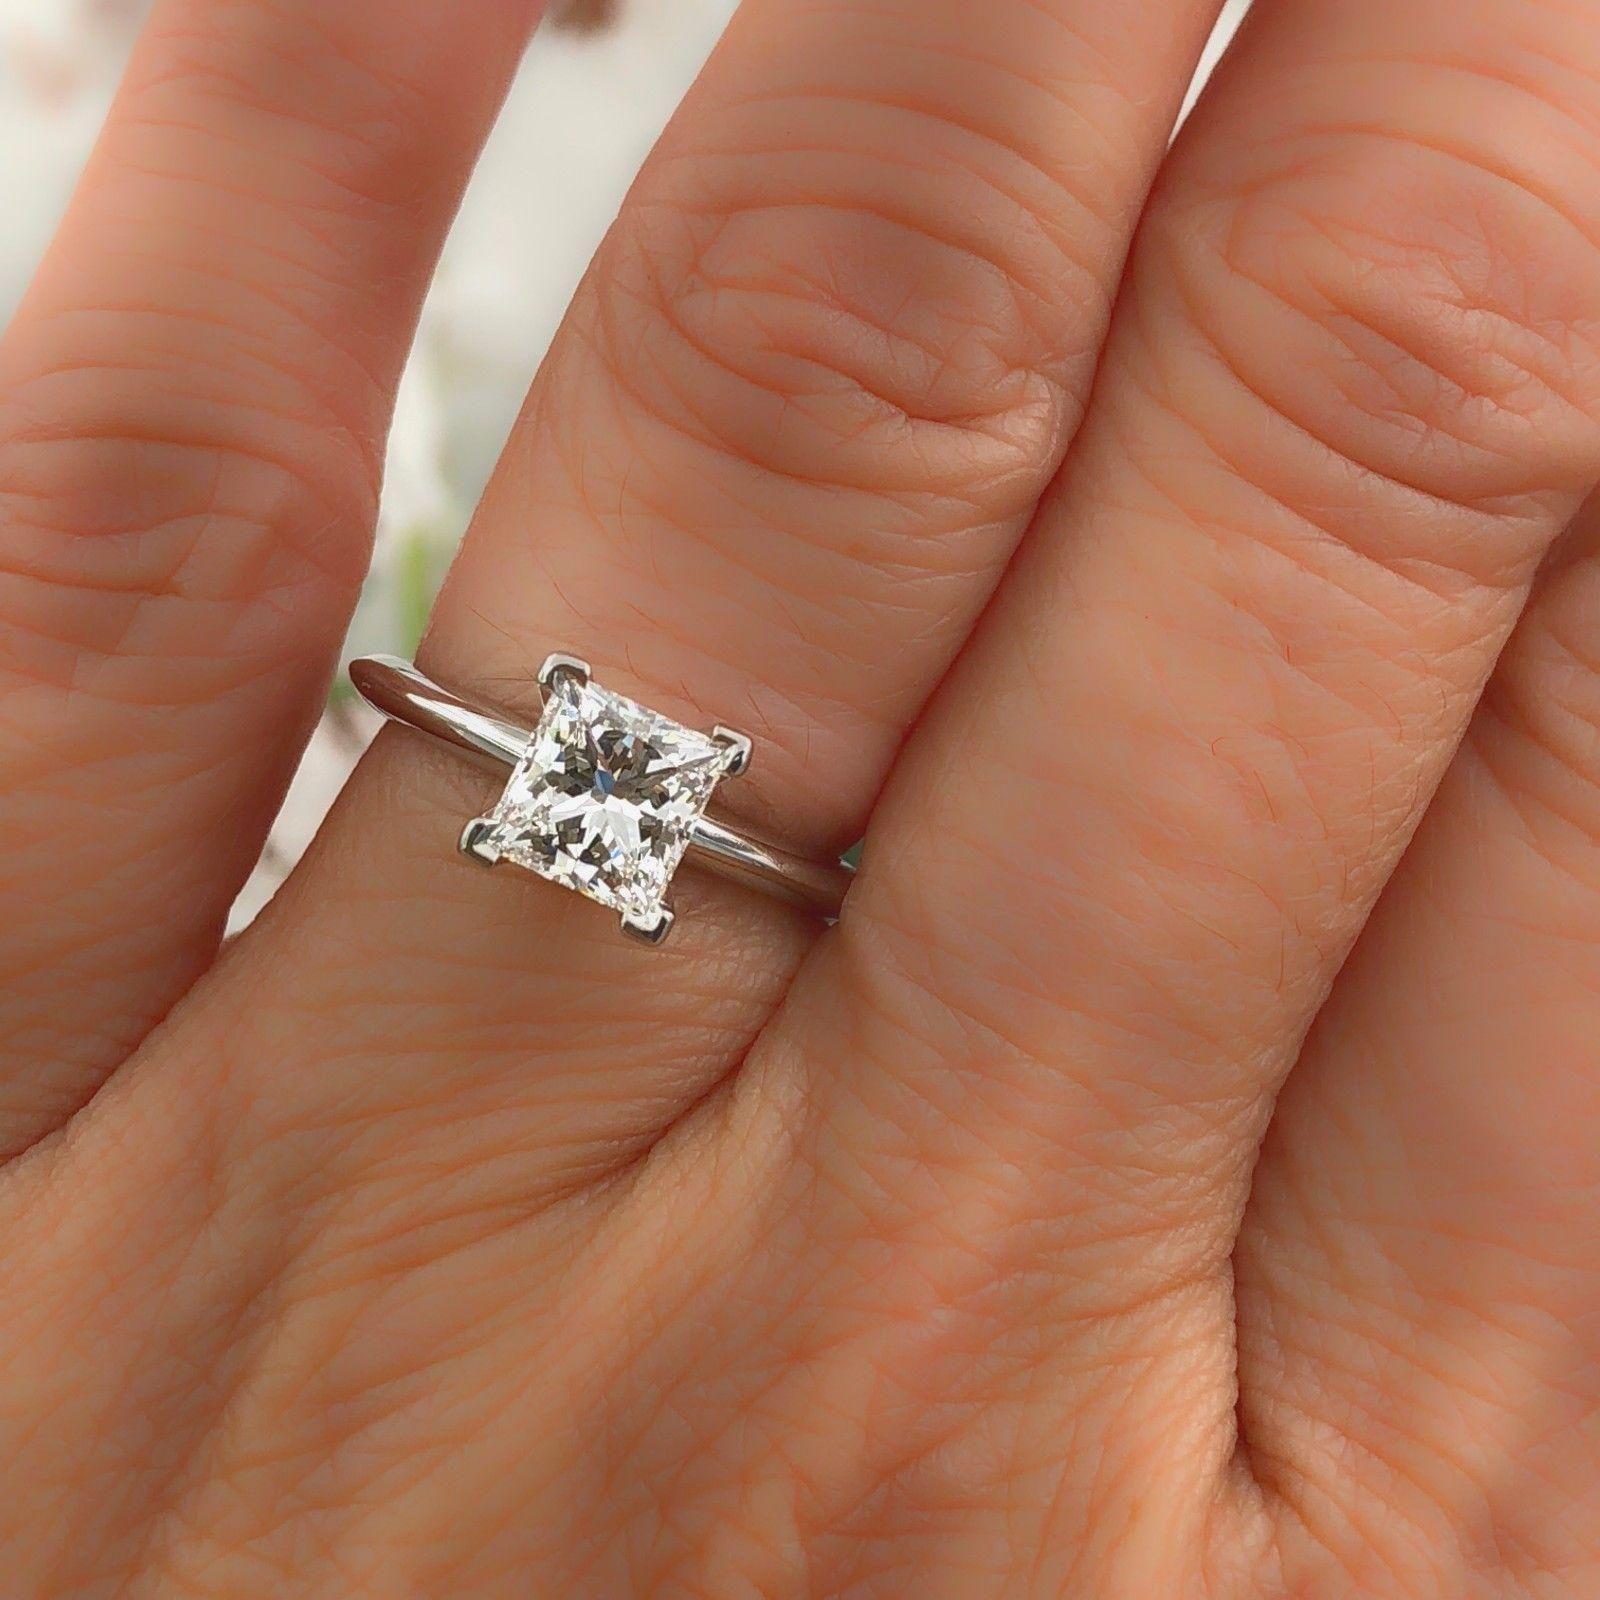 Tiffany And Co Platinum Diamond Engagement Ring Princess 0 71 Carat E Vs1 For Sale Princess Engagement Ring Engagement Rings Princess Womens Engagement Rings